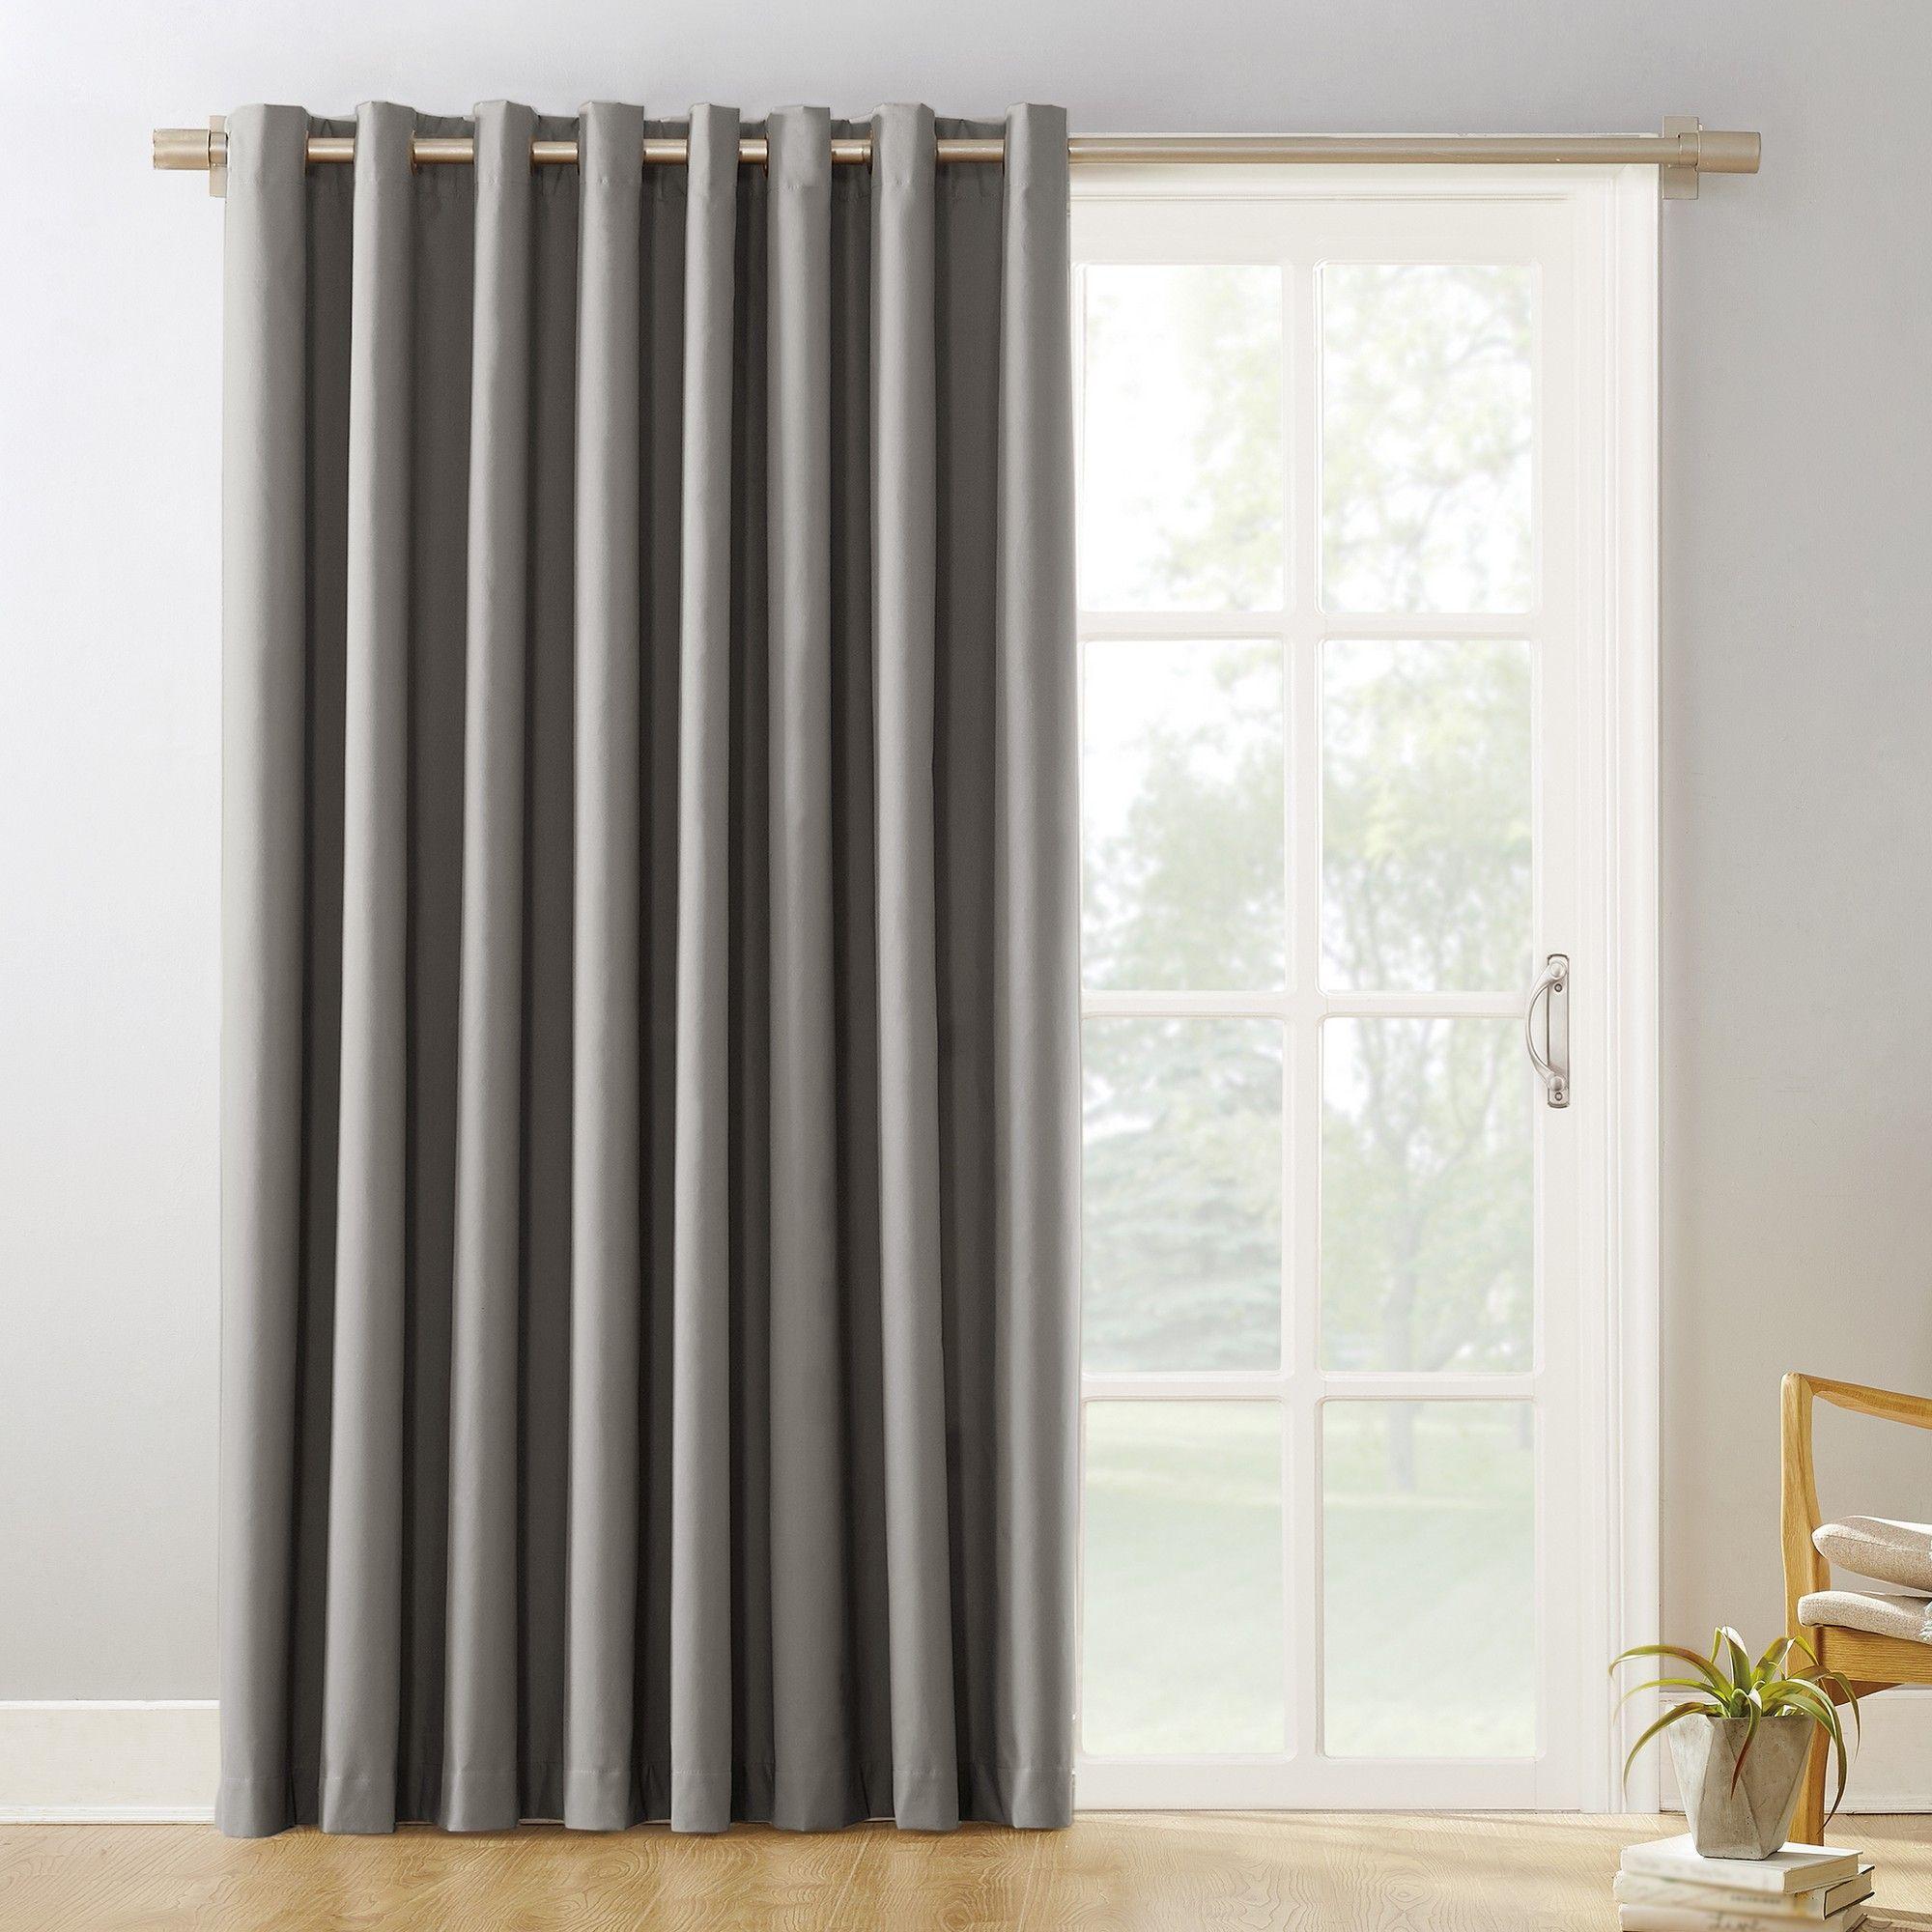 100 X84 Kenneth Extra Wide Blackout Sliding Patio Door Curtain Panel Gray Sun Zero Sliding Patio Doors Patio Doors Patio Door Curtains